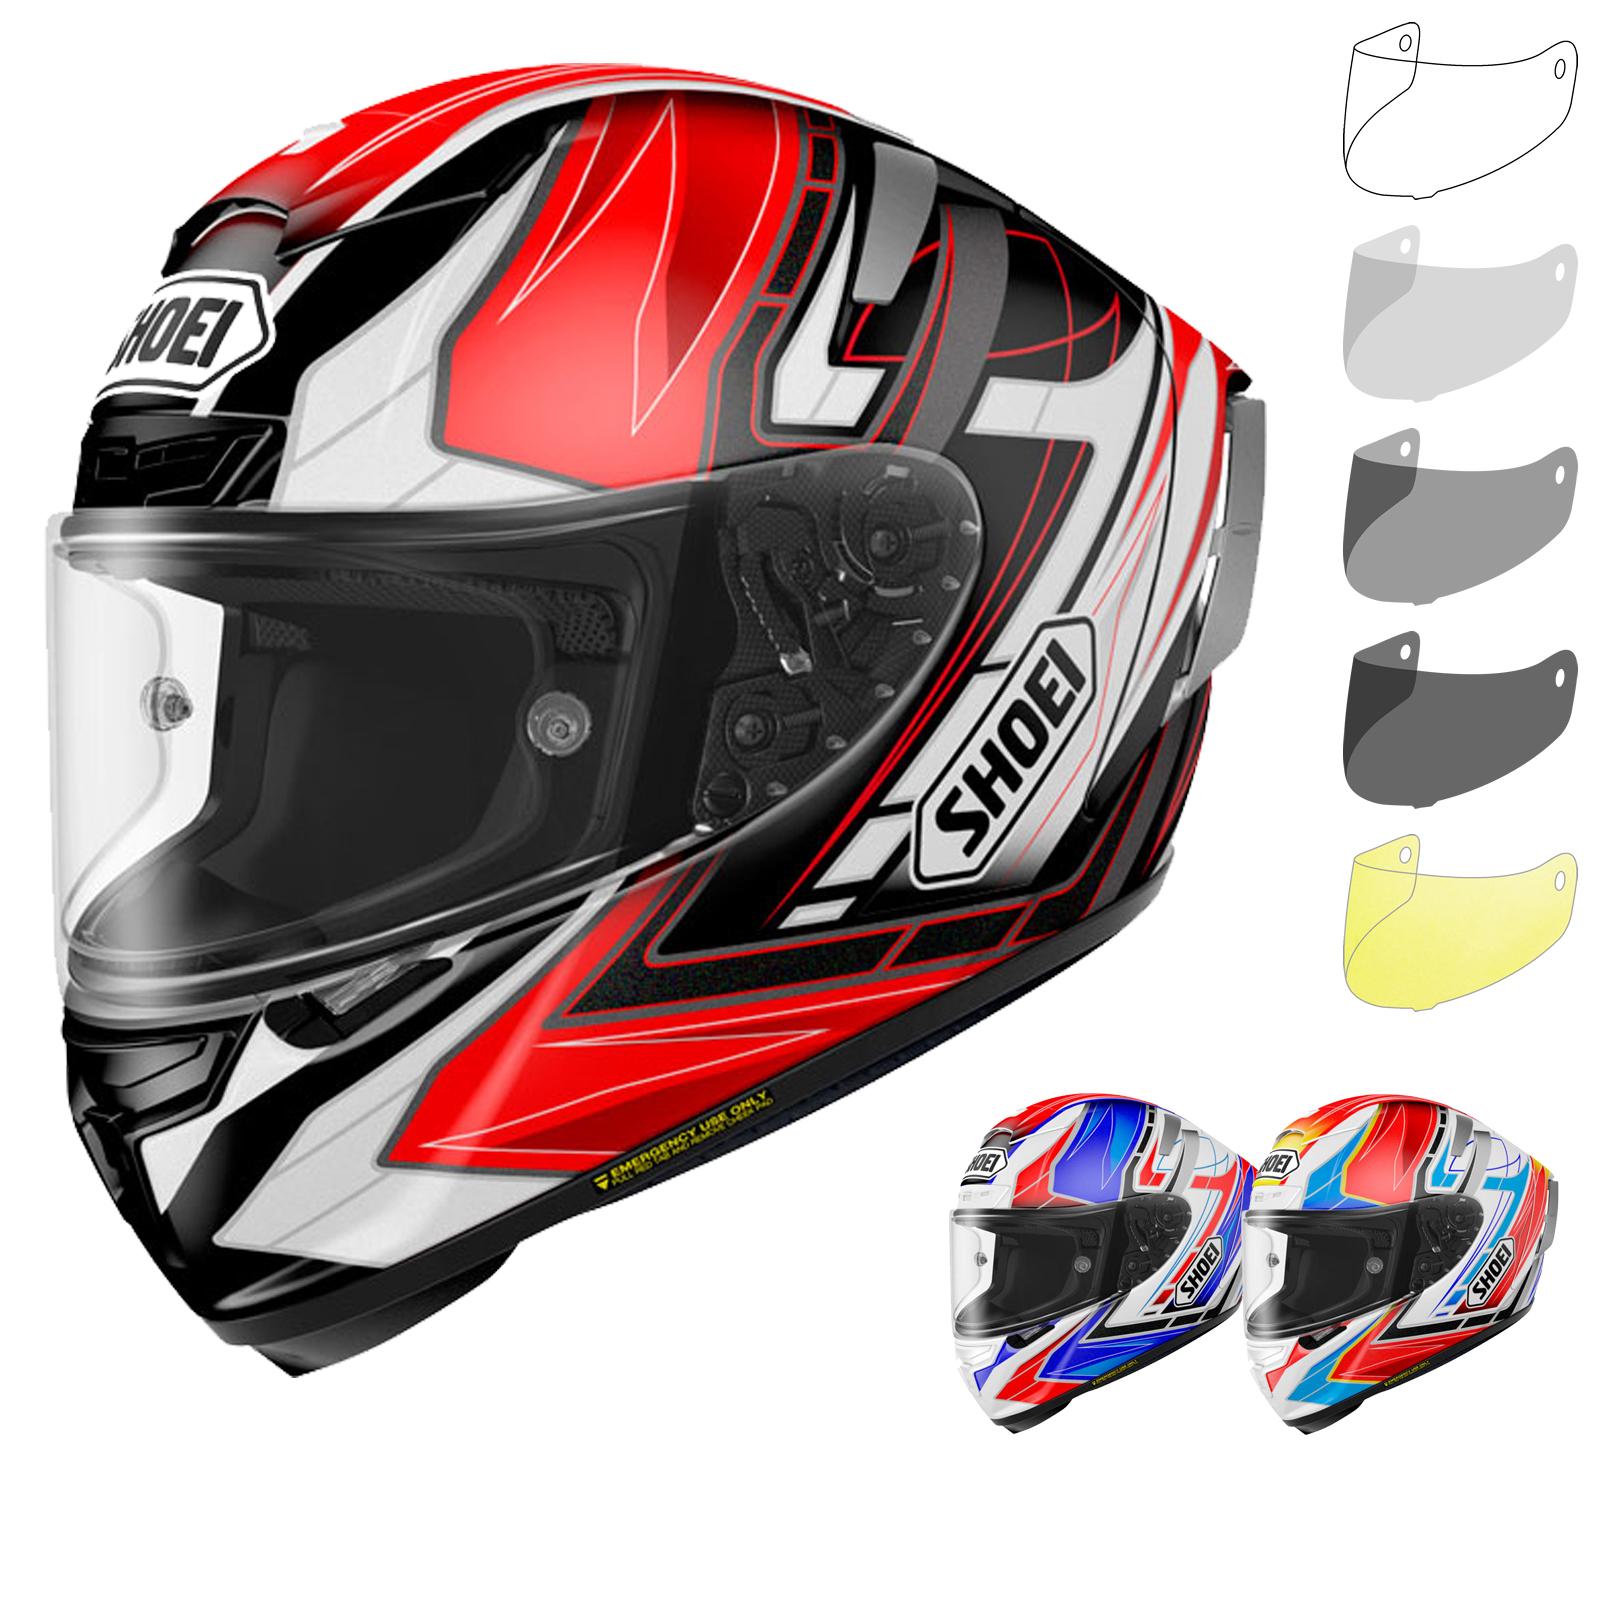 shoei x spirit 3 assail motorcycle helmet visor x spirit 3 helmets. Black Bedroom Furniture Sets. Home Design Ideas